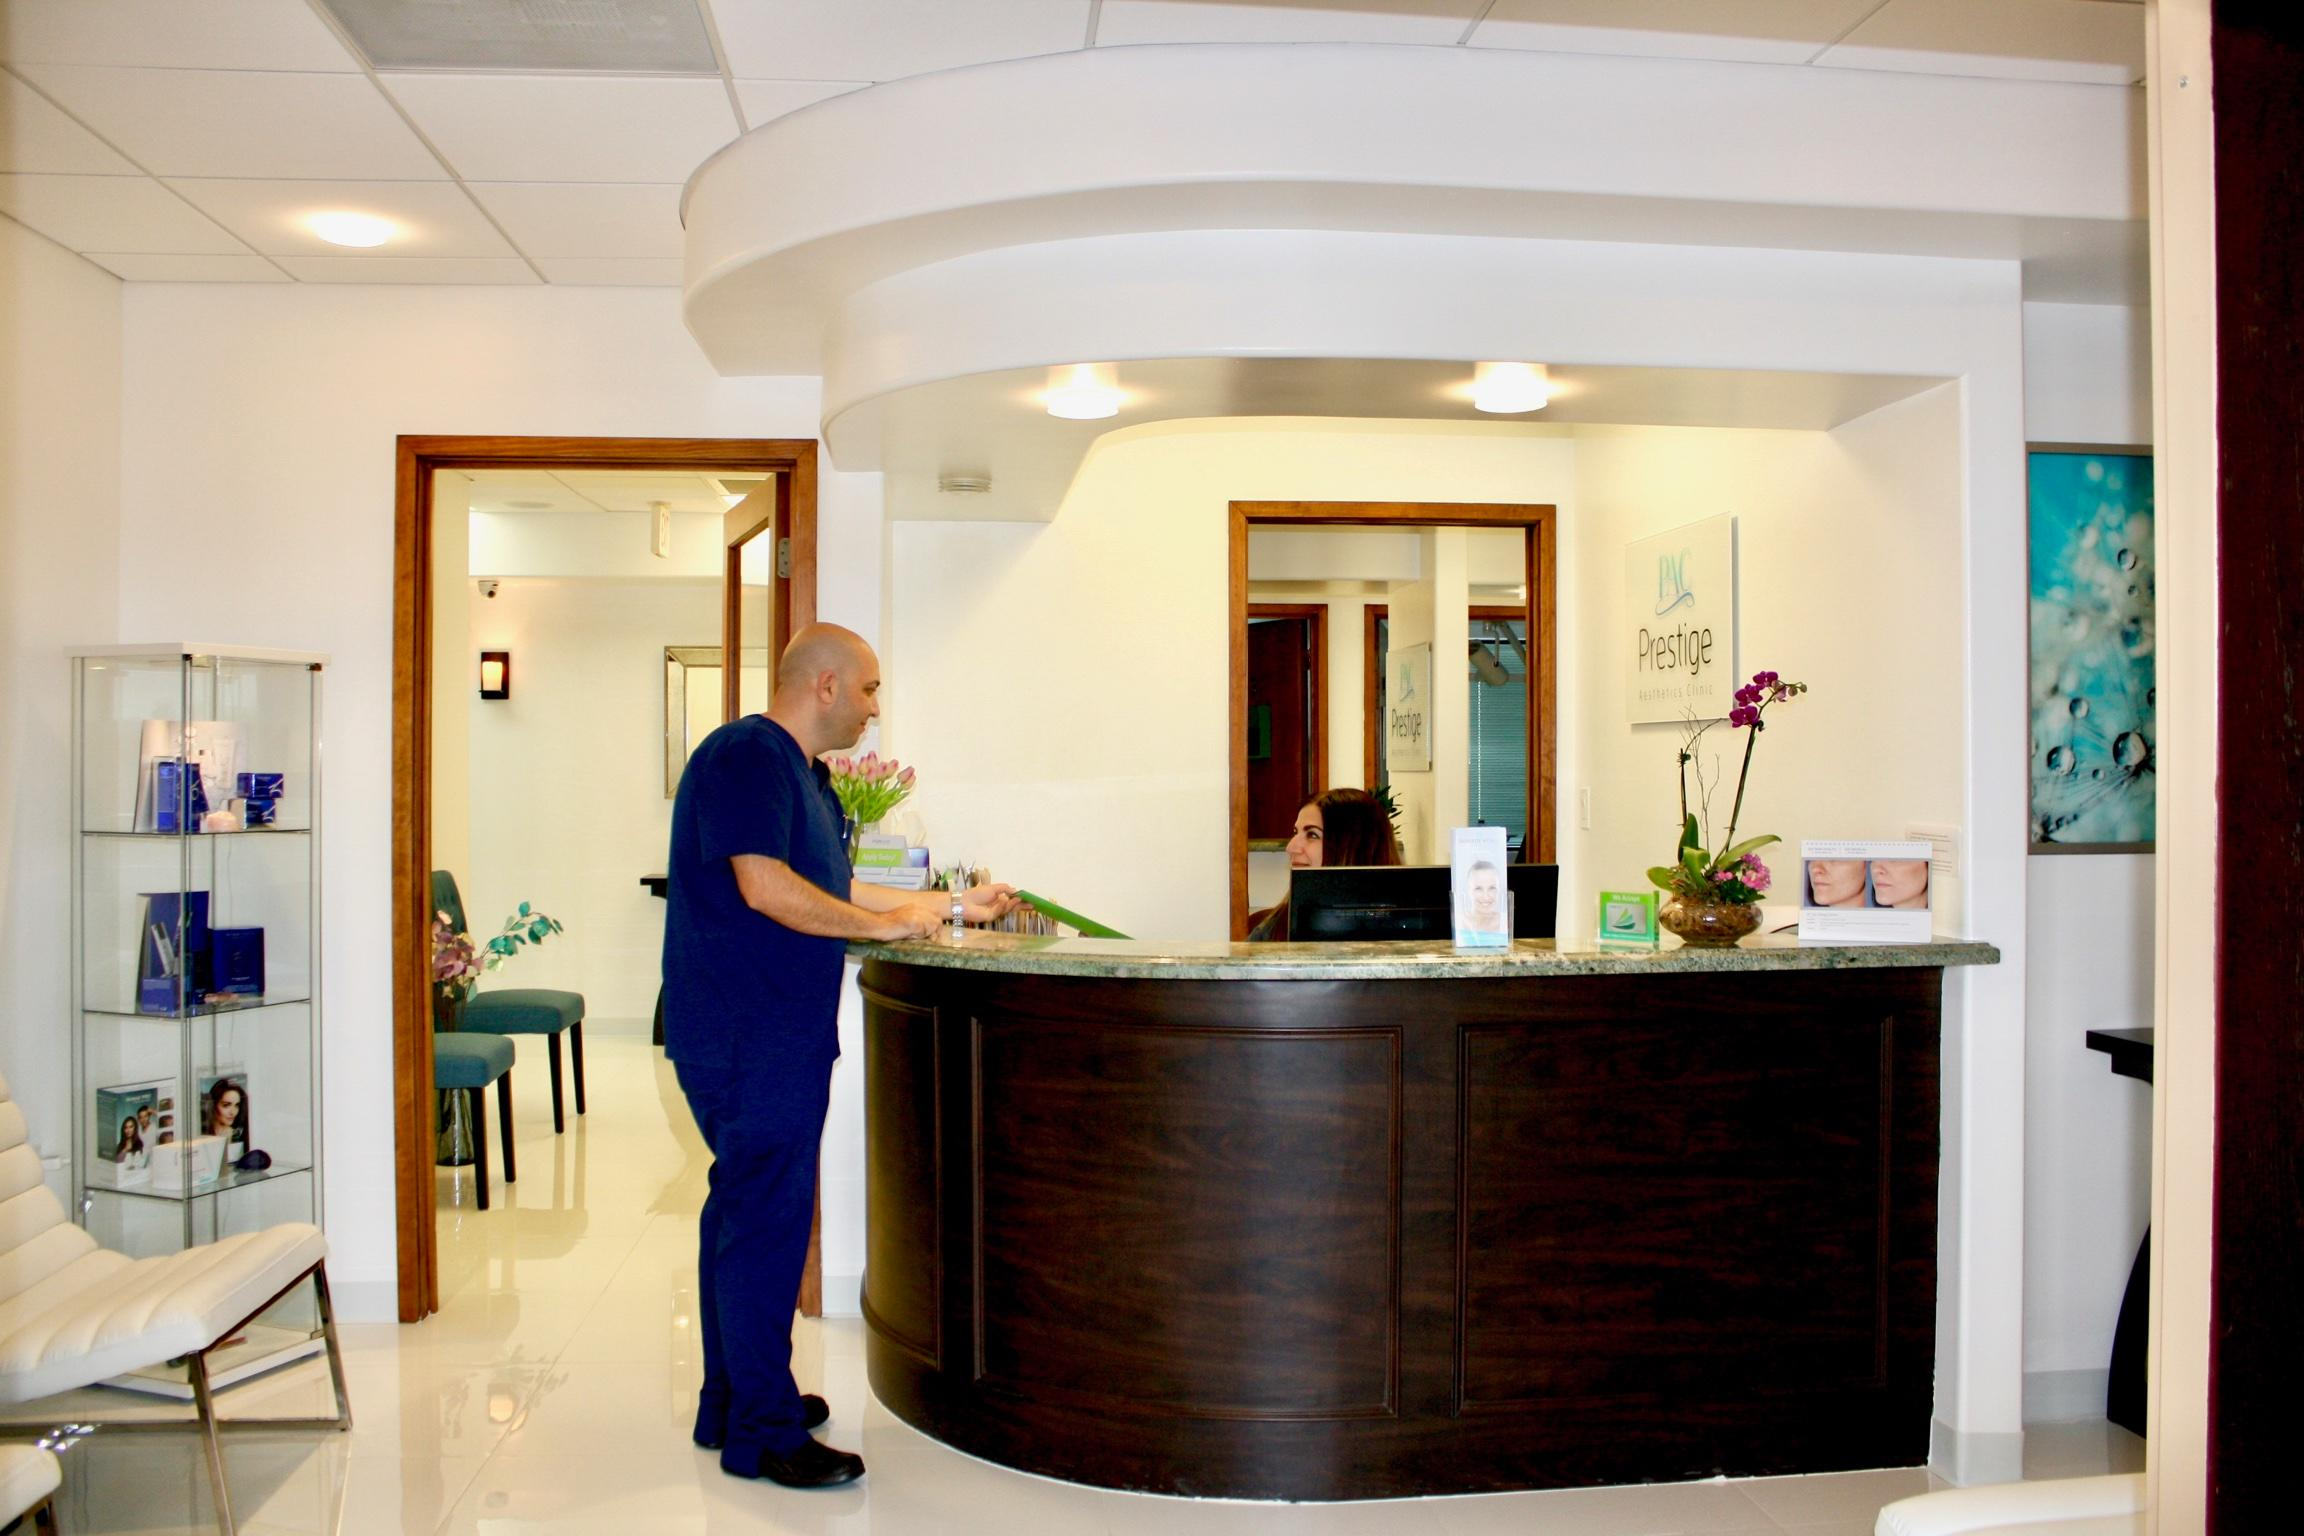 Prestige Aesthetics Clinic image 3